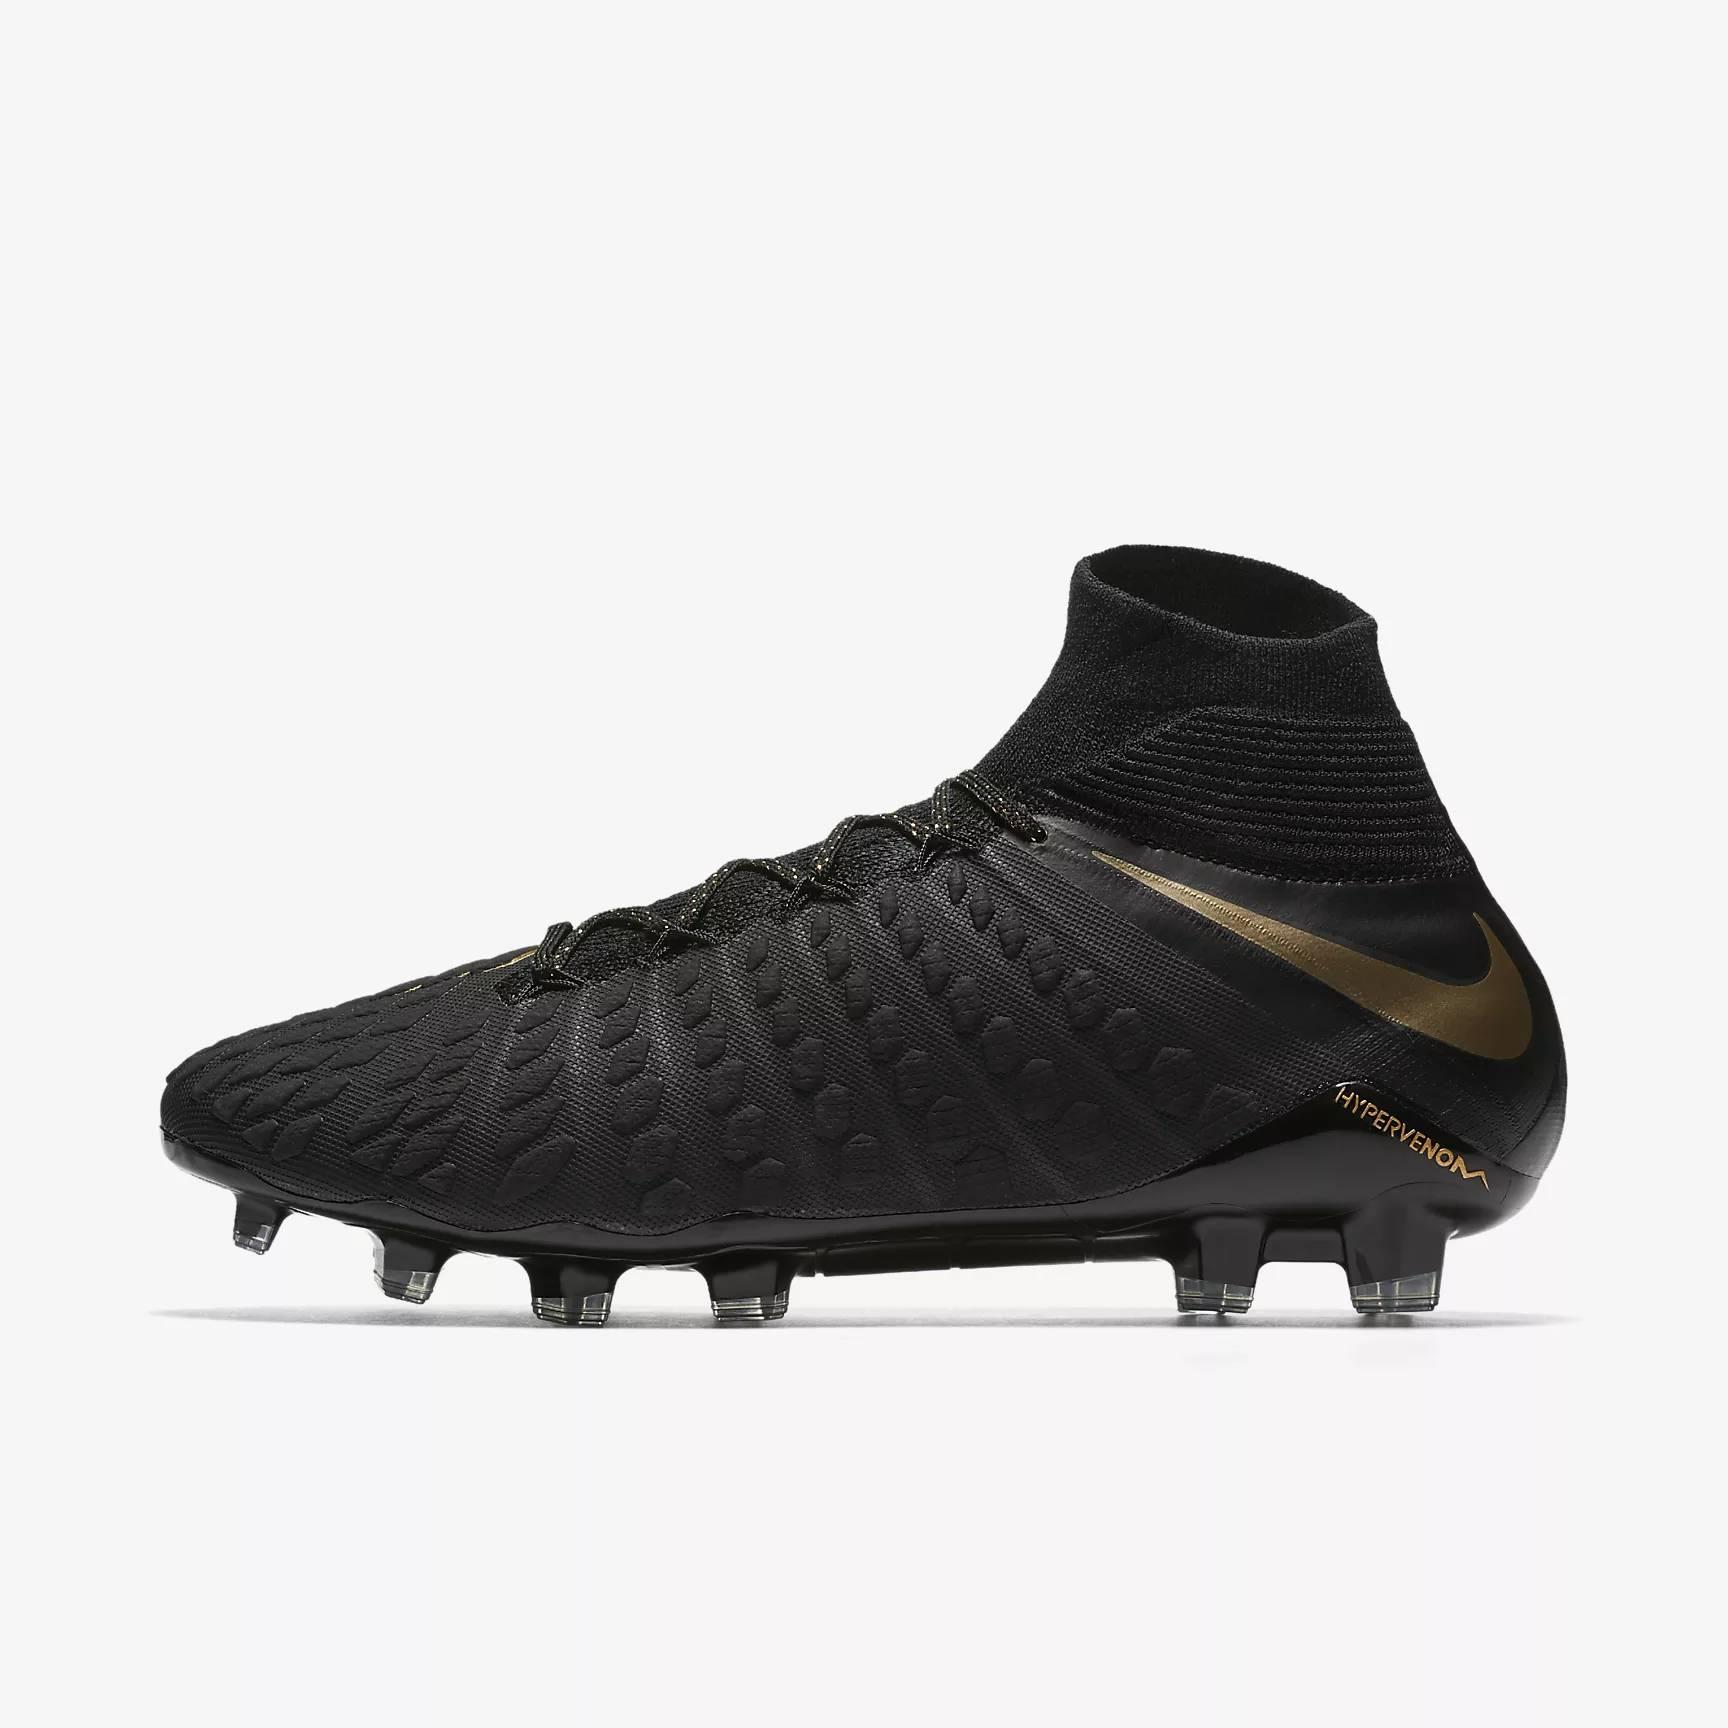 New Nike Hypervenom Soccer Shoes